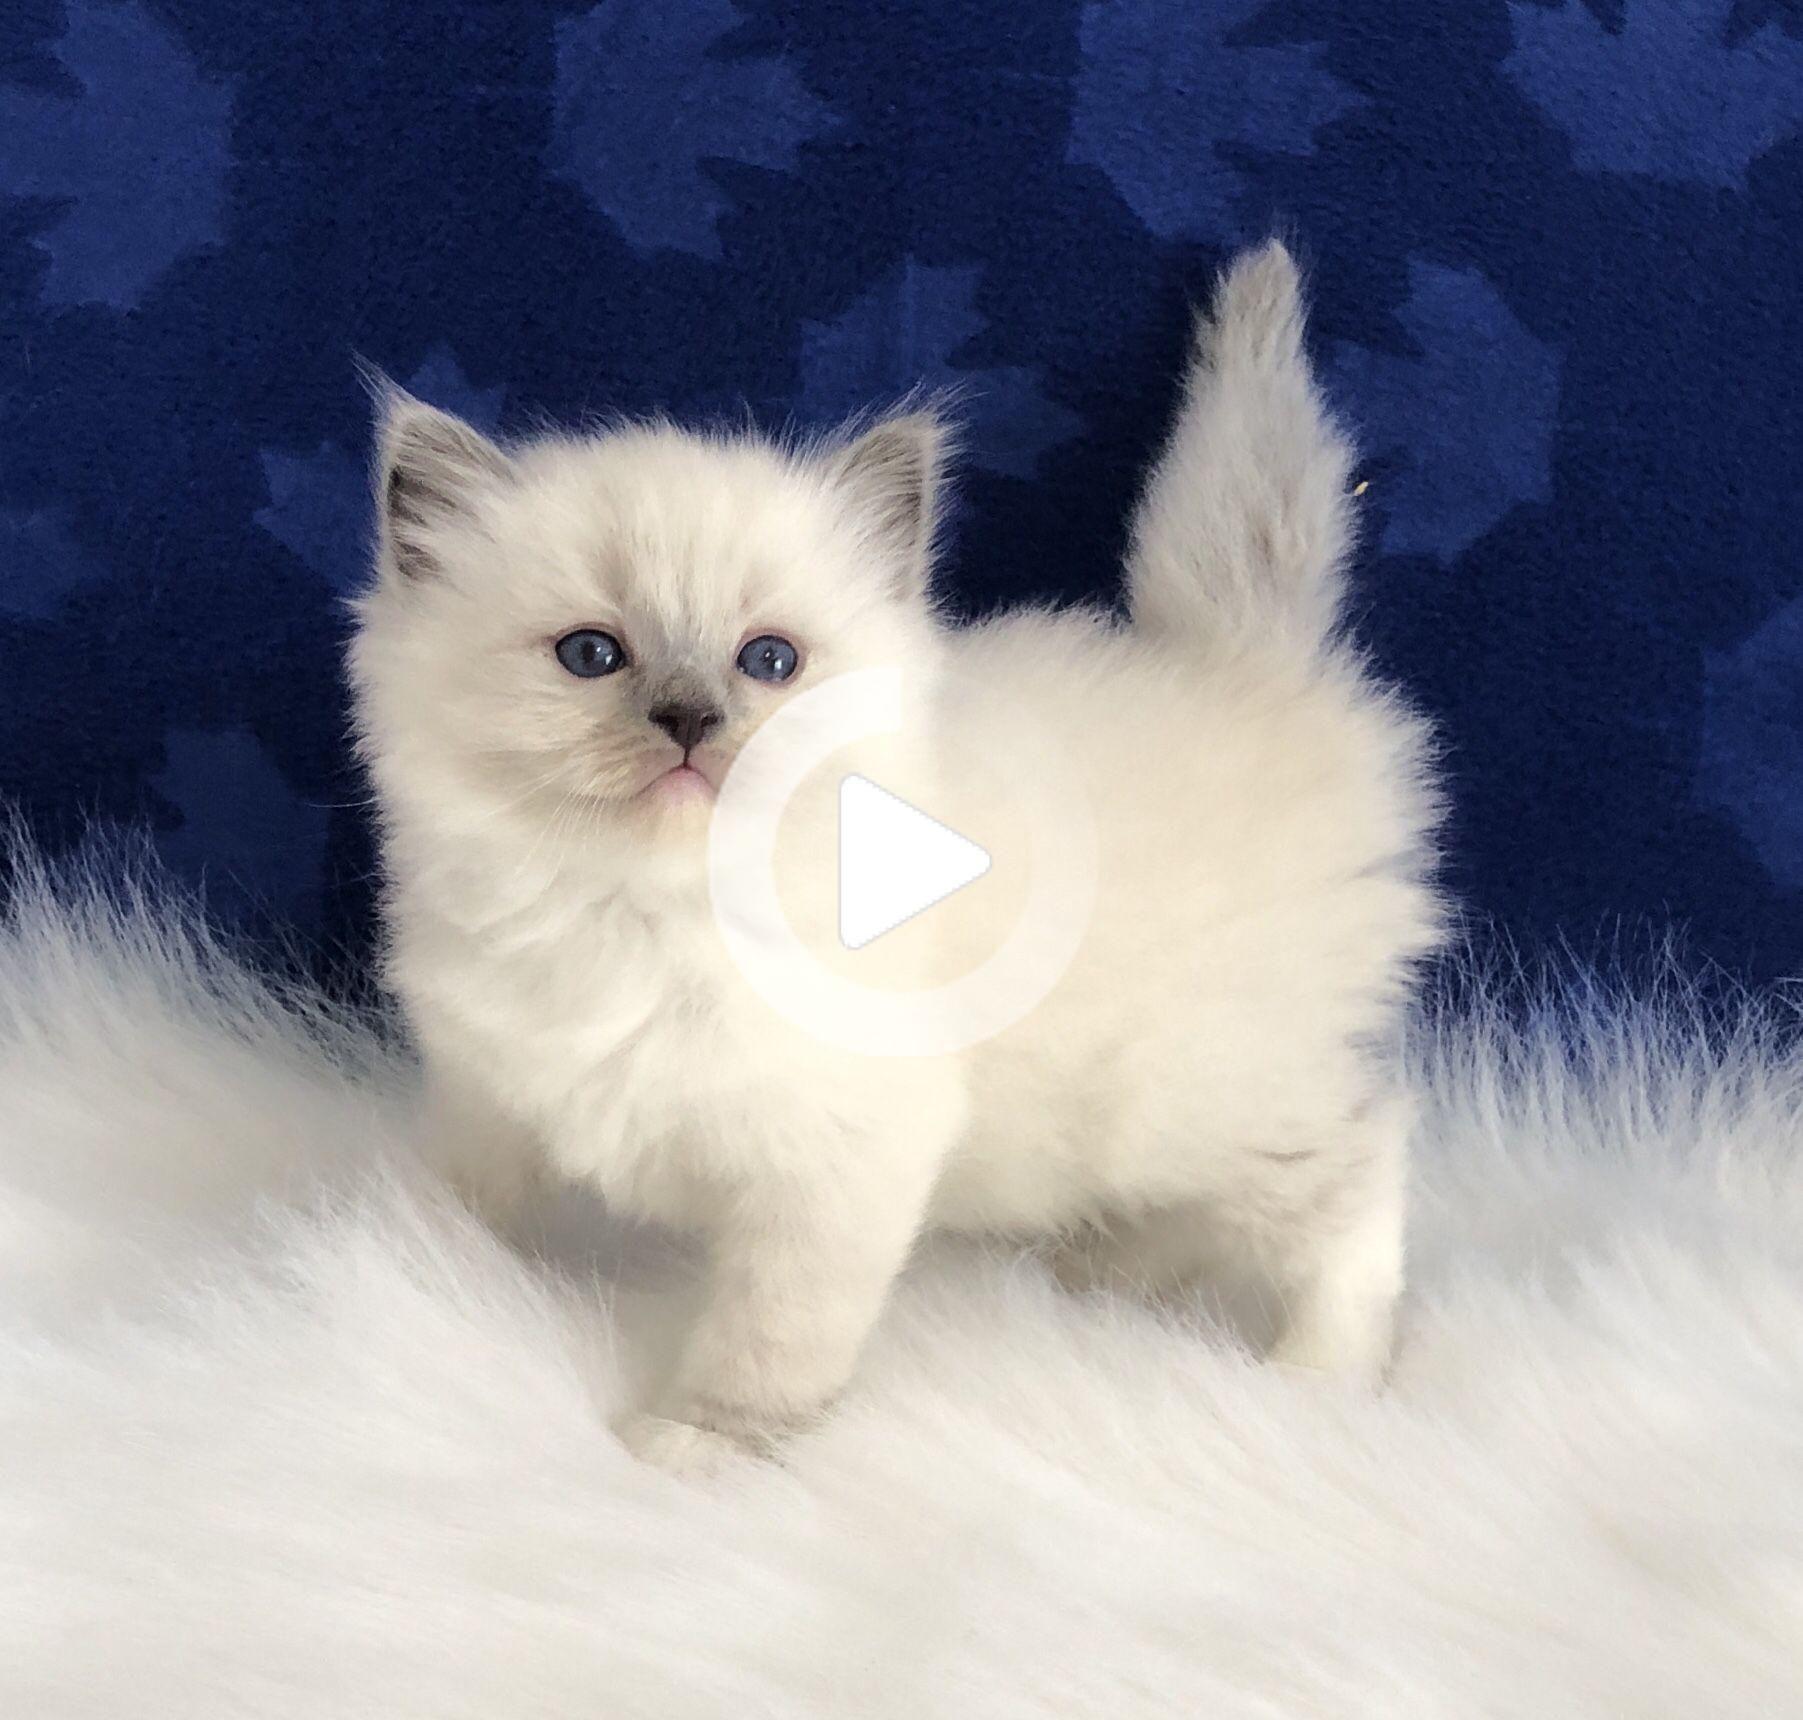 Ragdoll Cats Ragdoll Kittens For Sale O Canada Ragdolls Cinnamon Ragdolls Solid Ragdolls Mink In 2020 Ragdoll Kittens For Sale Ragdoll Cat Ragdoll Kitten